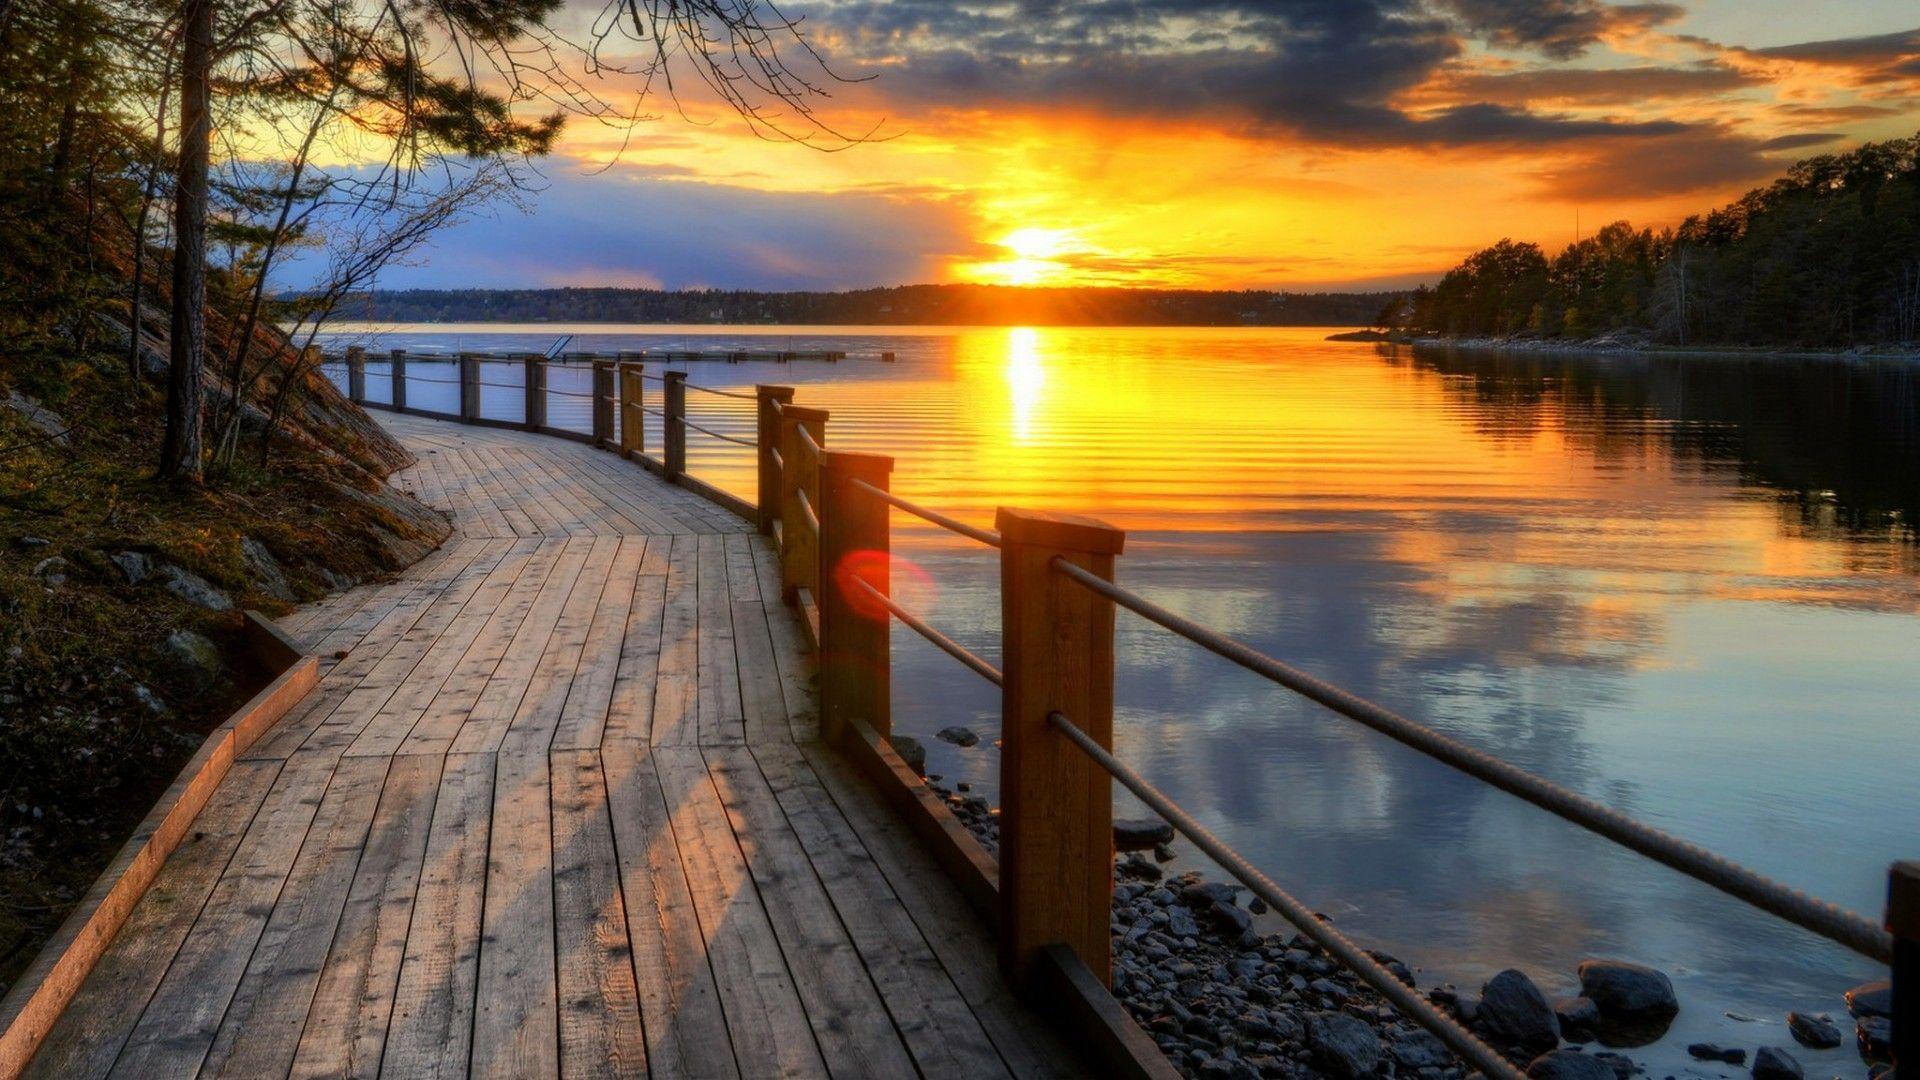 Lake Sunset Wallpapers Top Free Lake Sunset Backgrounds Wallpaperaccess